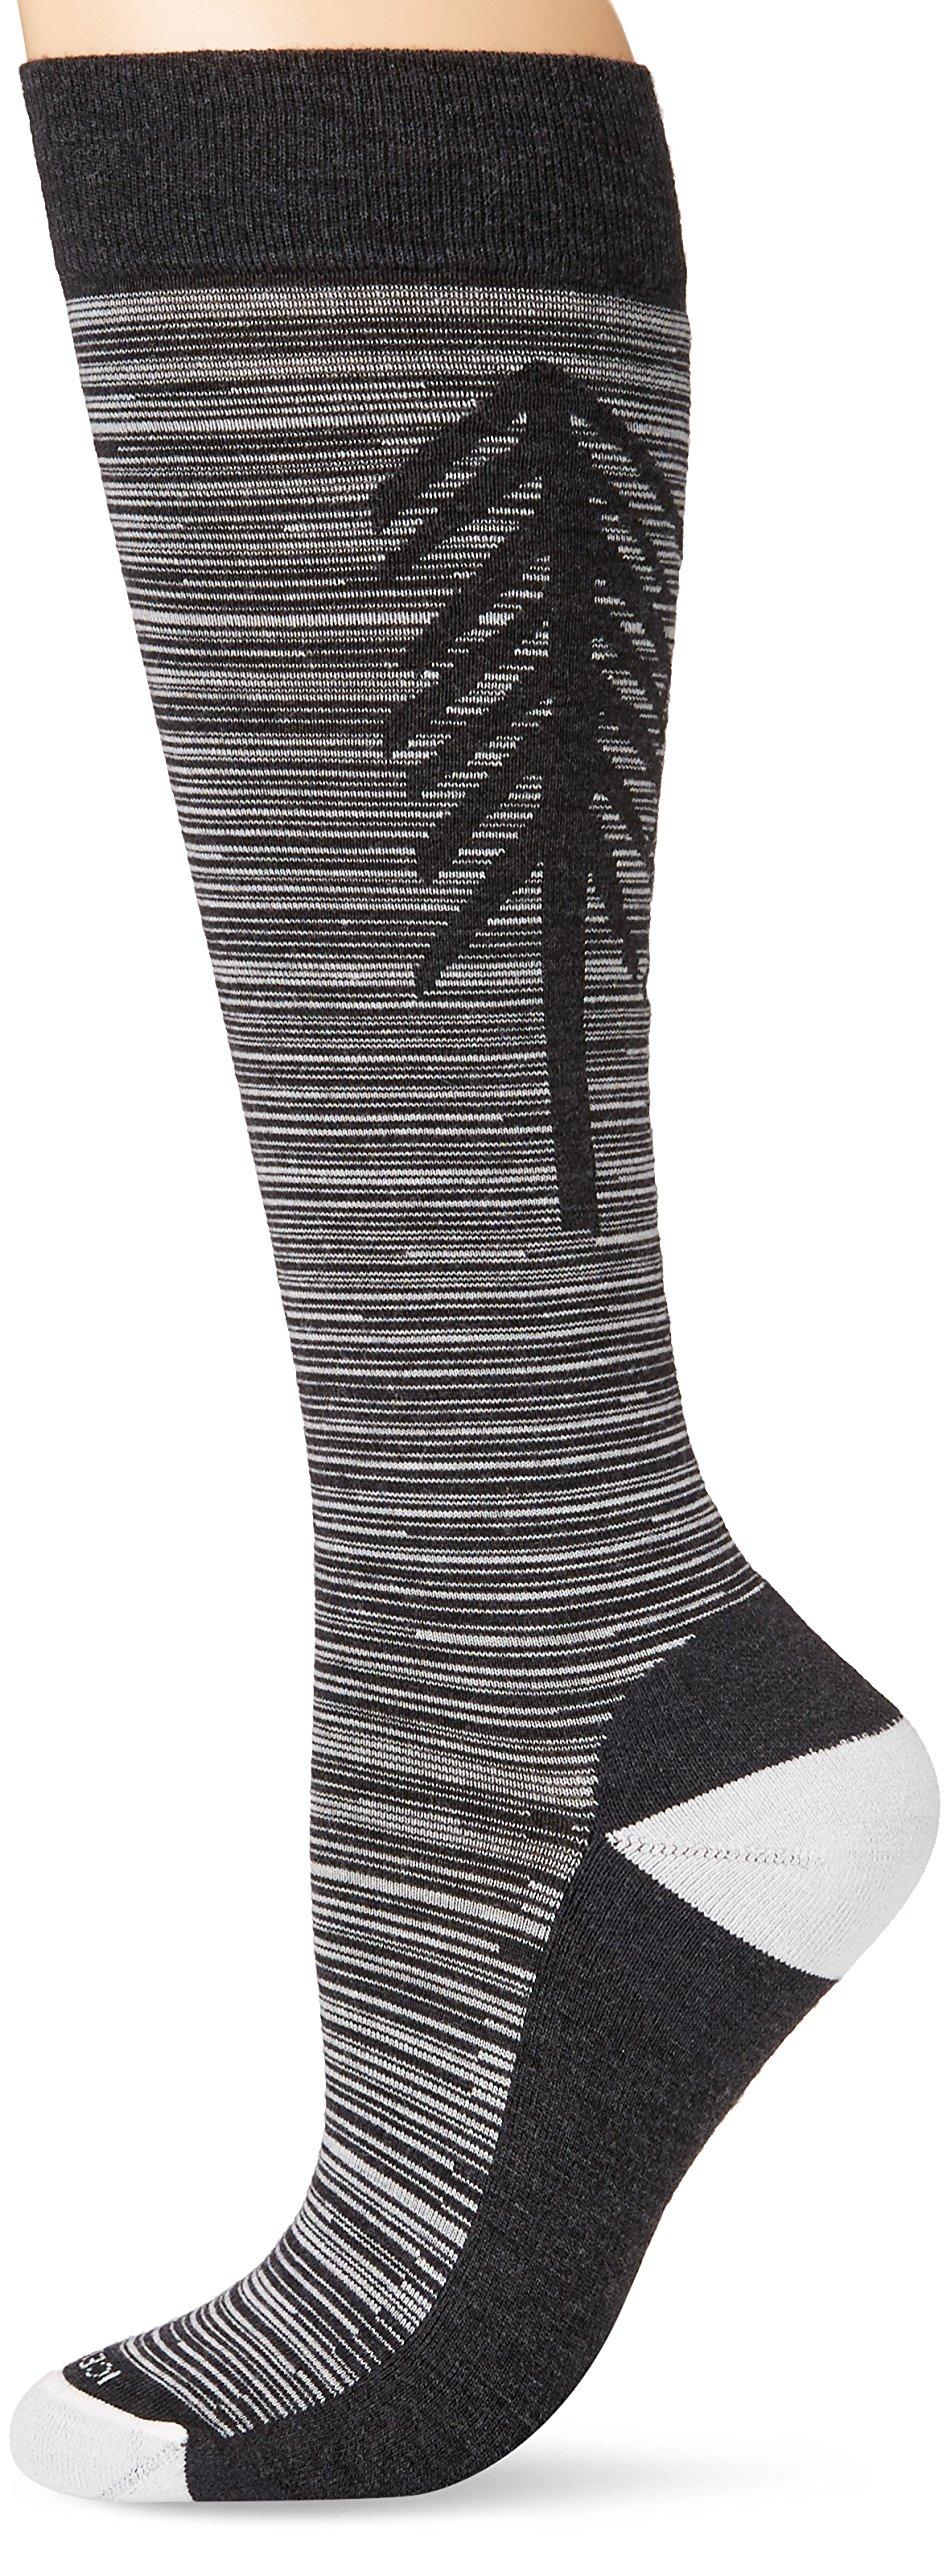 Icebreaker Merino Women's Lifestyle Light Over The Calf Socks, Jet Heather/Snow, Large